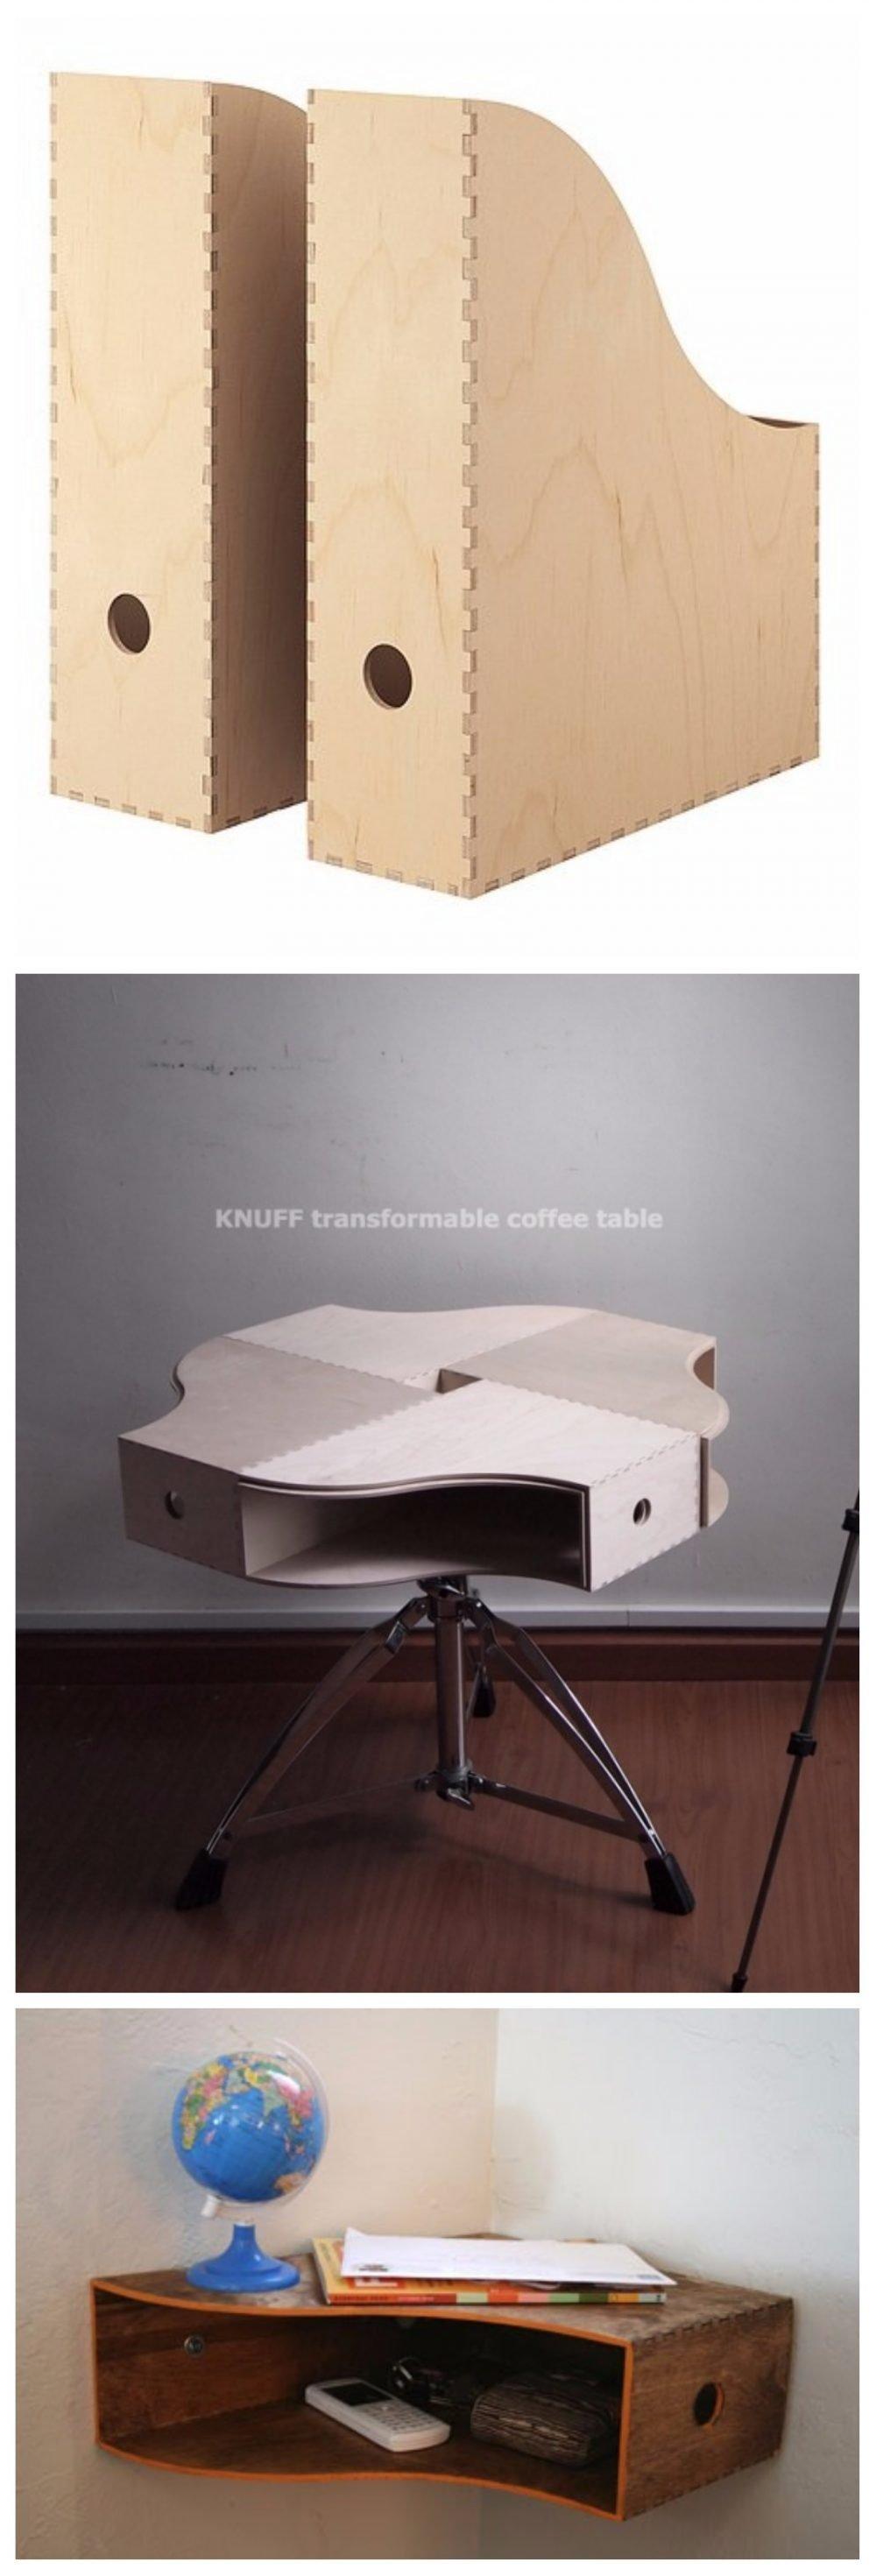 relooker transformer un meuble IKEA facilement table basse ikea diy range revues dossier